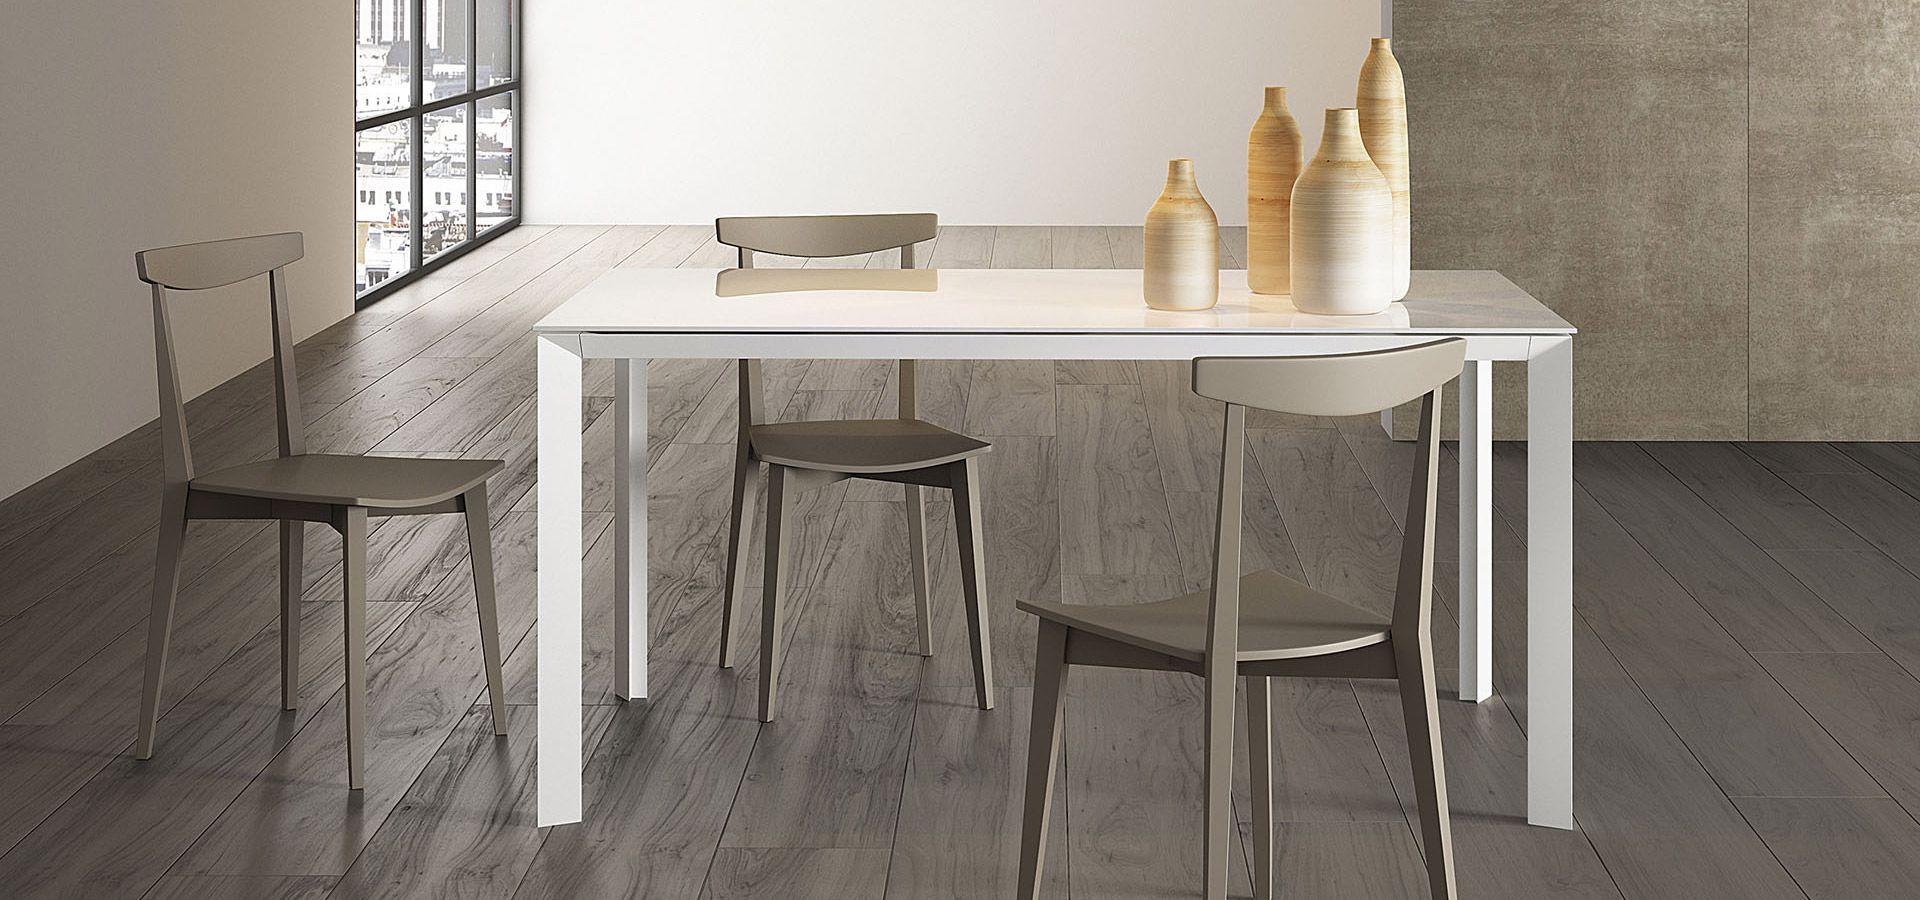 Pin by arredo3 on tavoli moderni pinterest - Tavolo eclisse calligaris ...